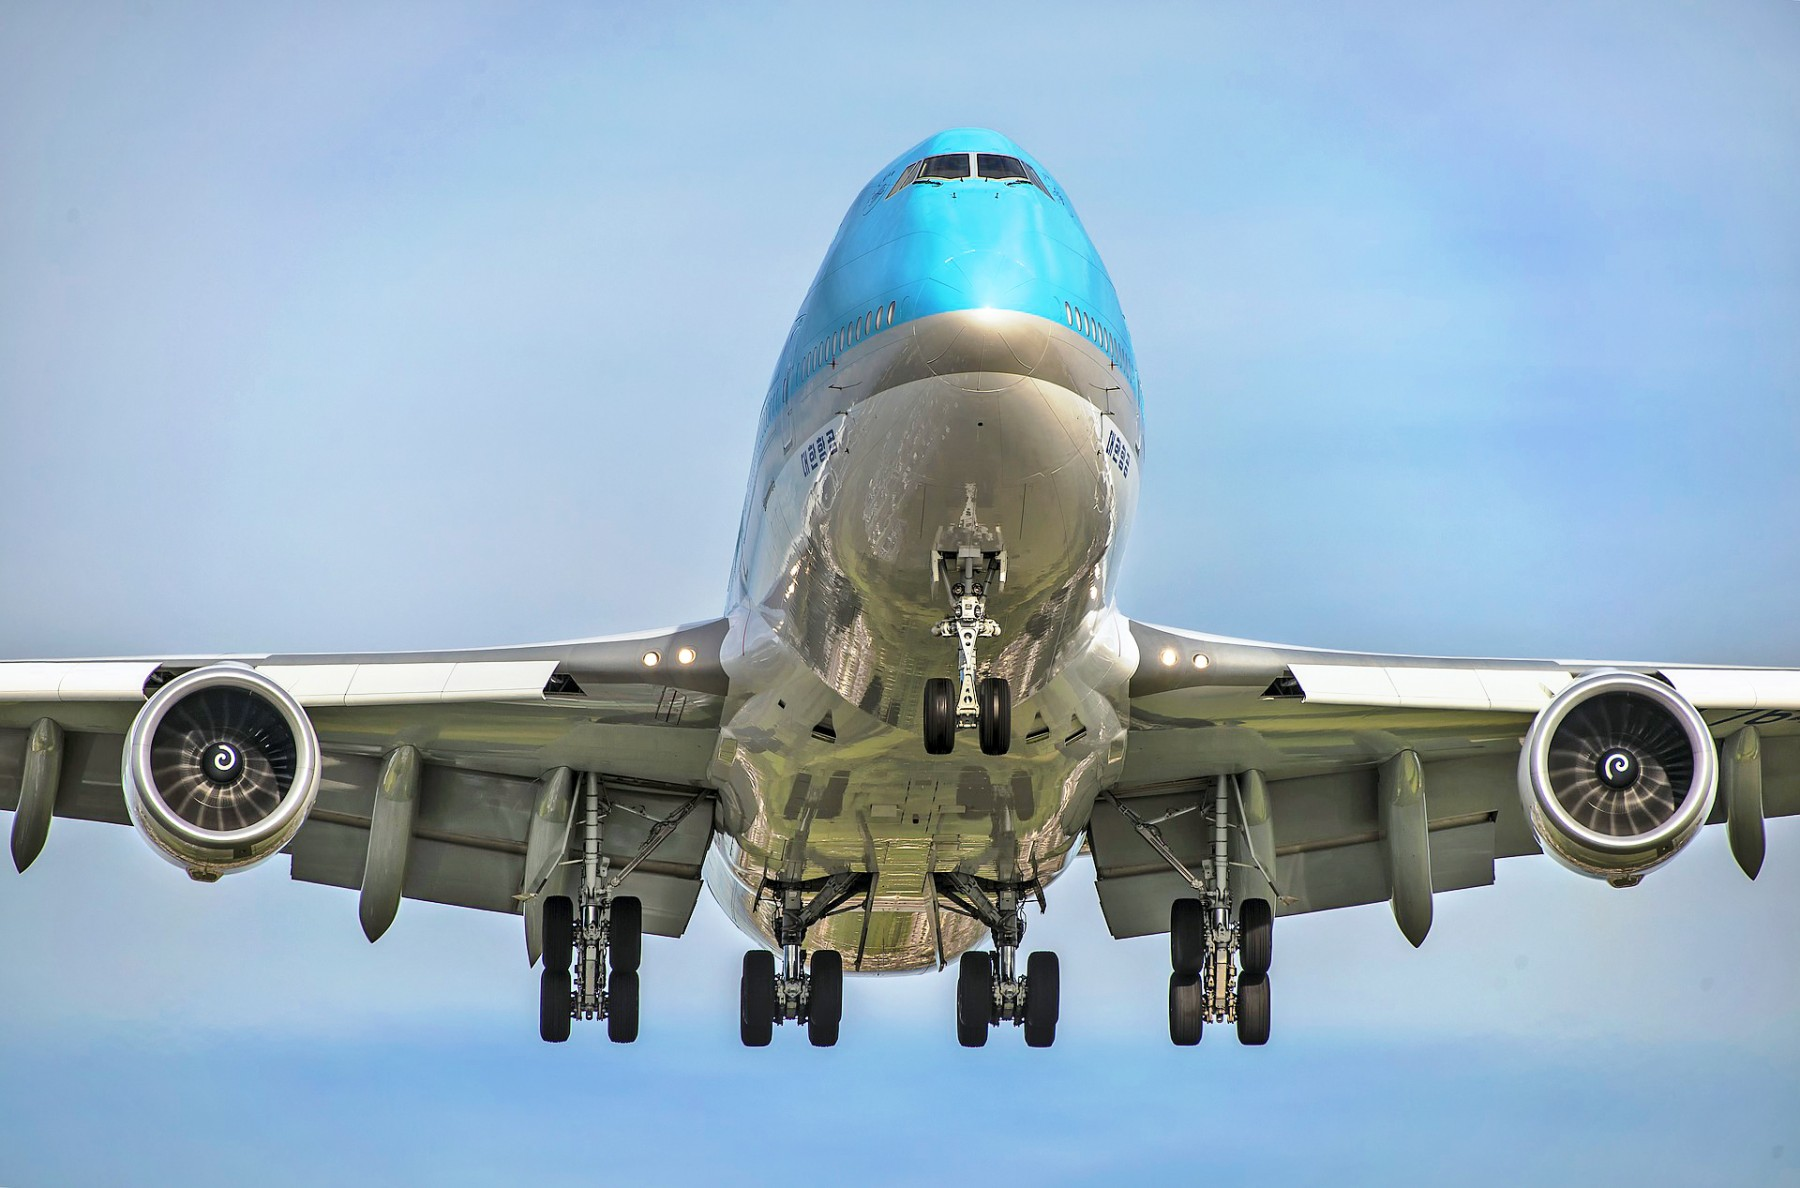 Korean Air: Βρέθηκε λύση για να αποφύγει την πτώχευση